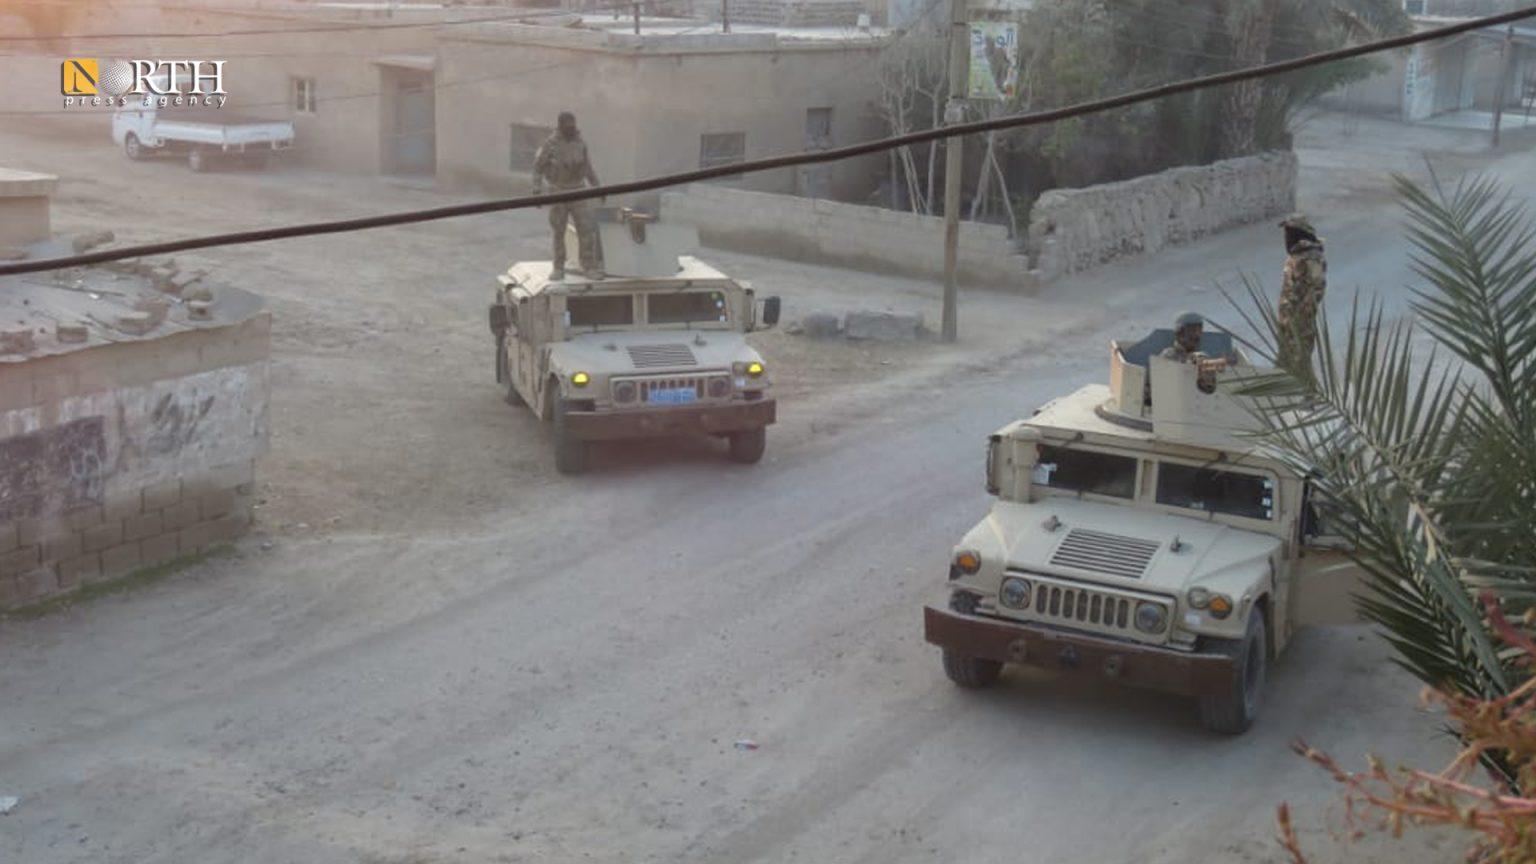 SDF checkpoint in al-Shuhail town, east Deir ez-Zor – North Press